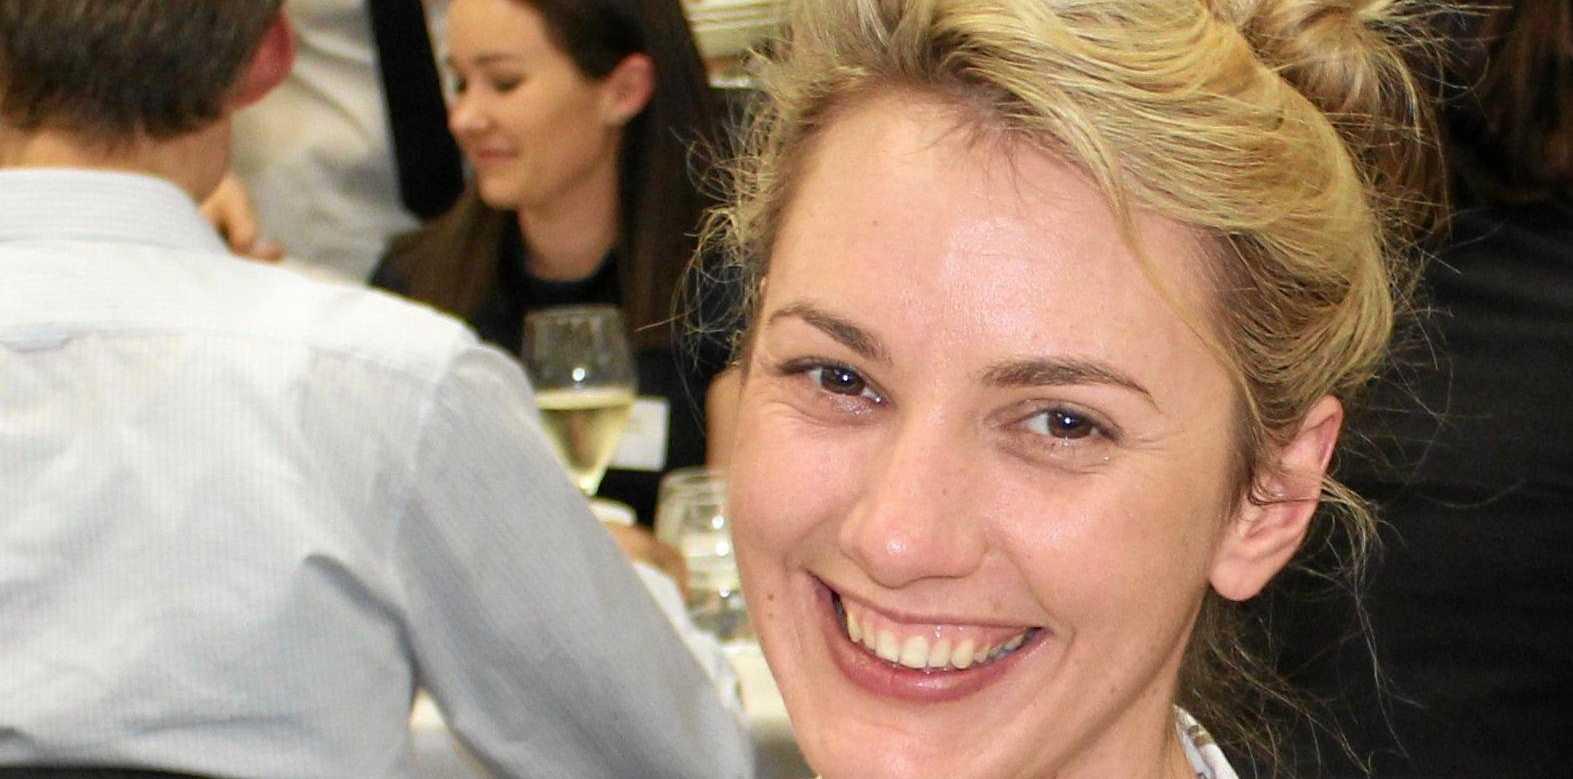 Alanna Sapwell